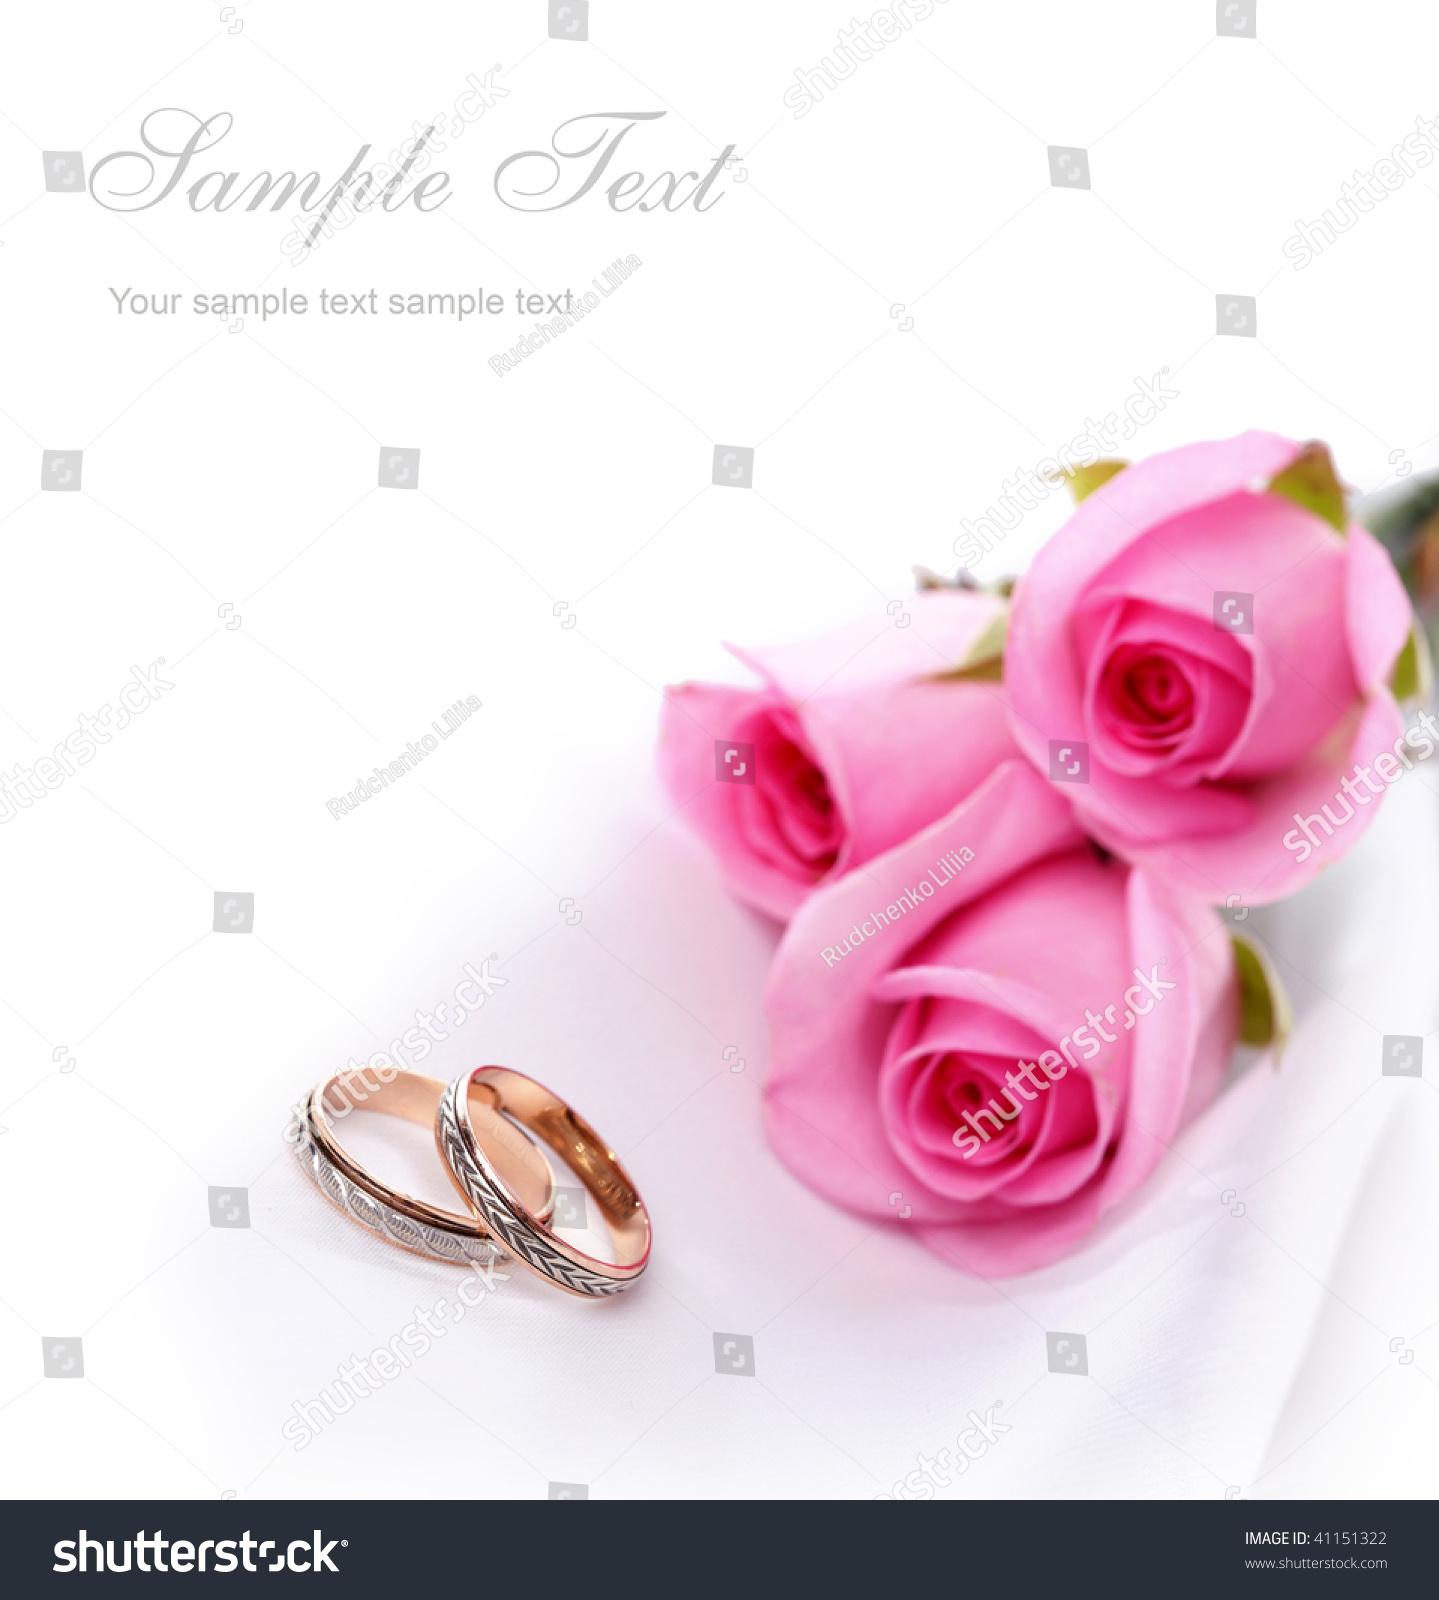 Wedding Rings Pink Roses Stock Photo (Royalty Free) 41151322 ...